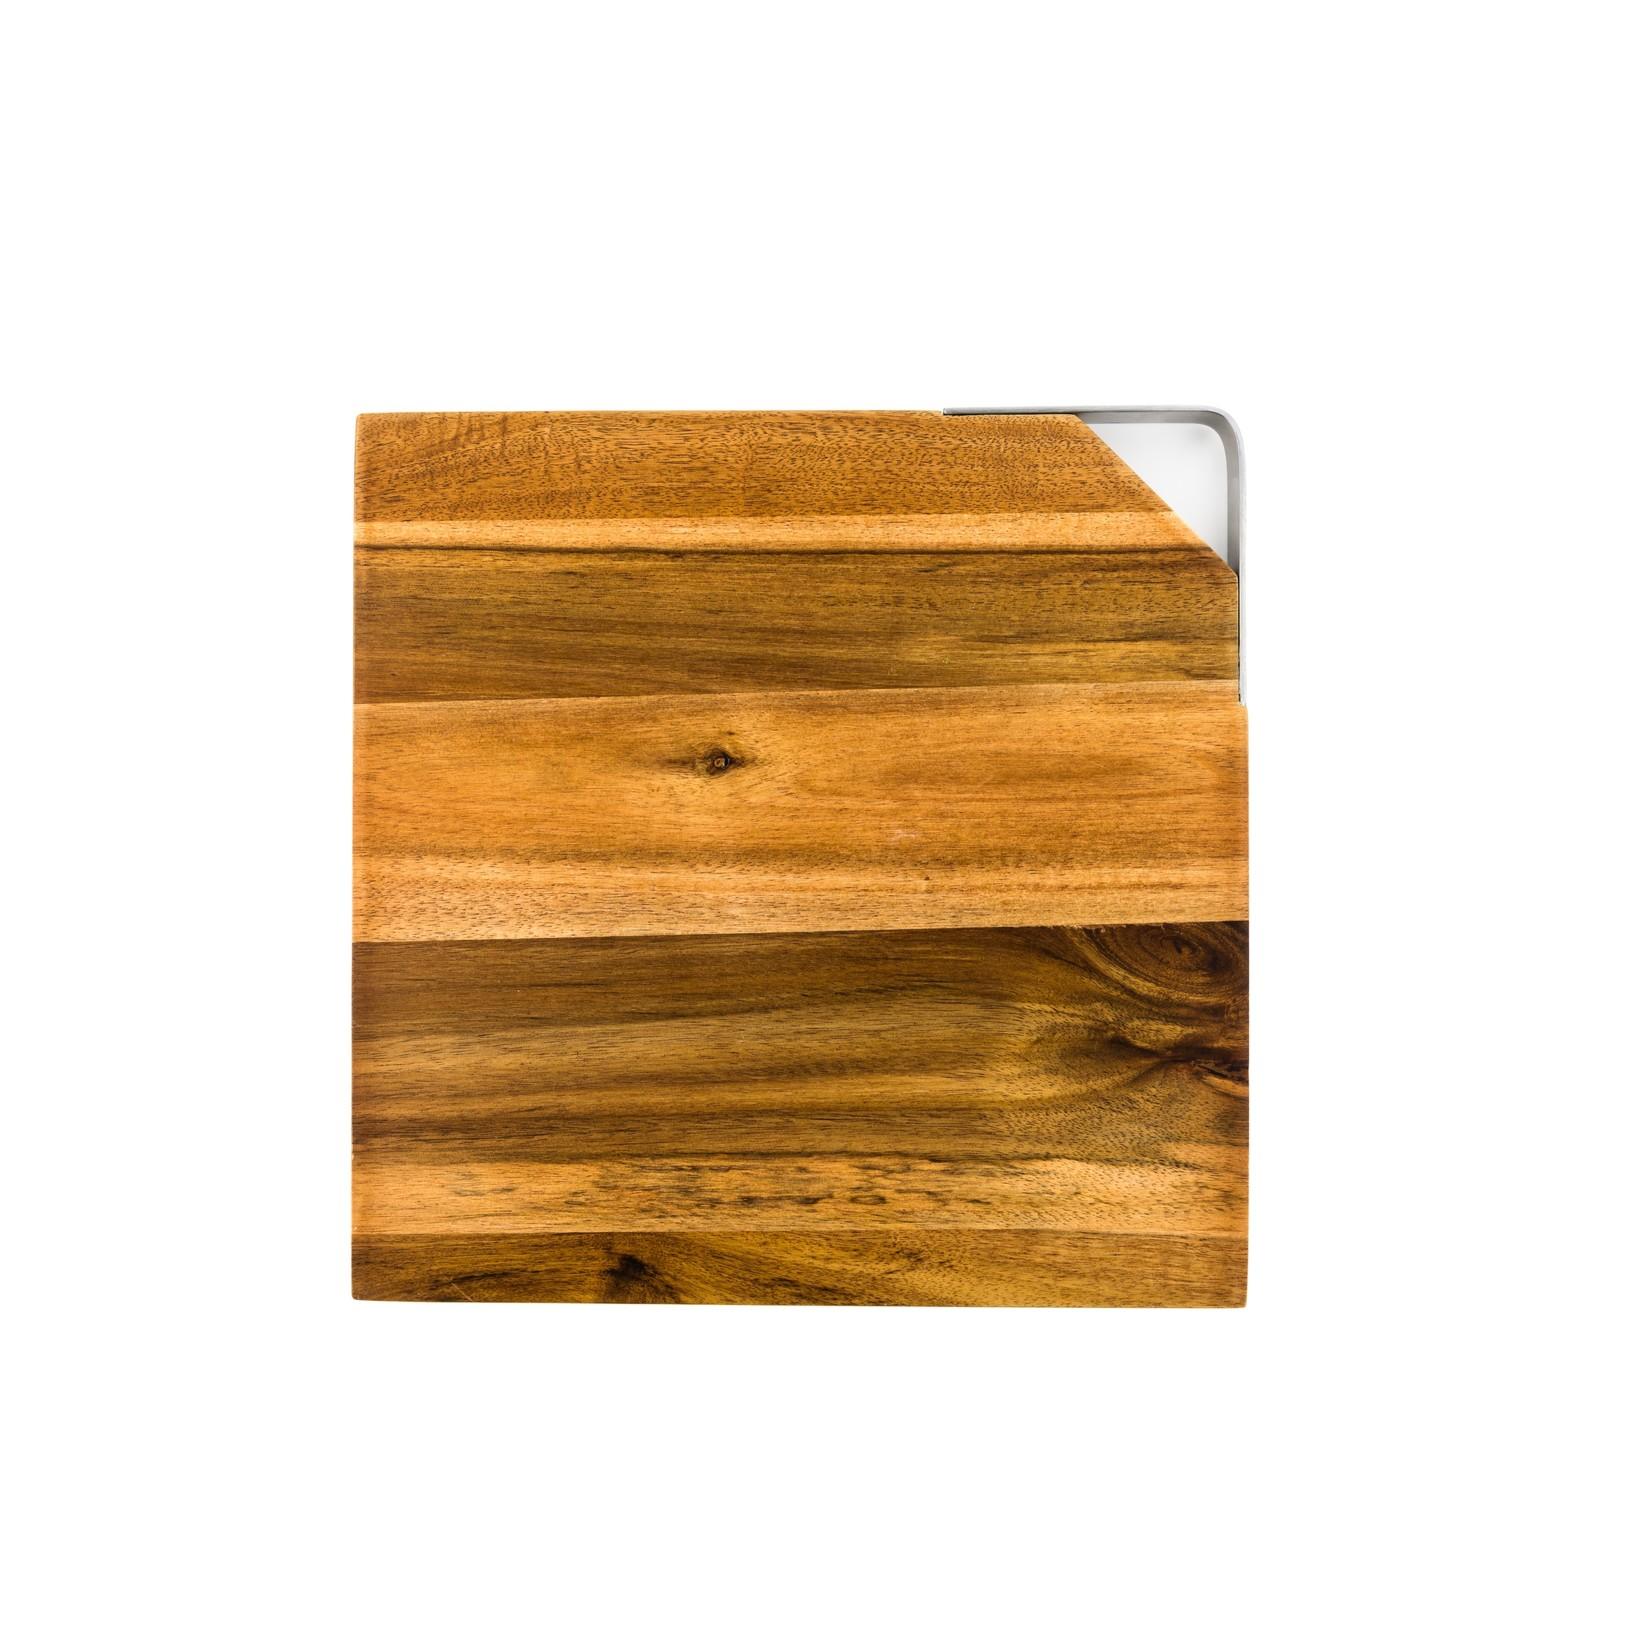 Laguiole Style de Vie Laguiole Style de Vie Innovation Line kaasmessenset 3-delig met snijplank